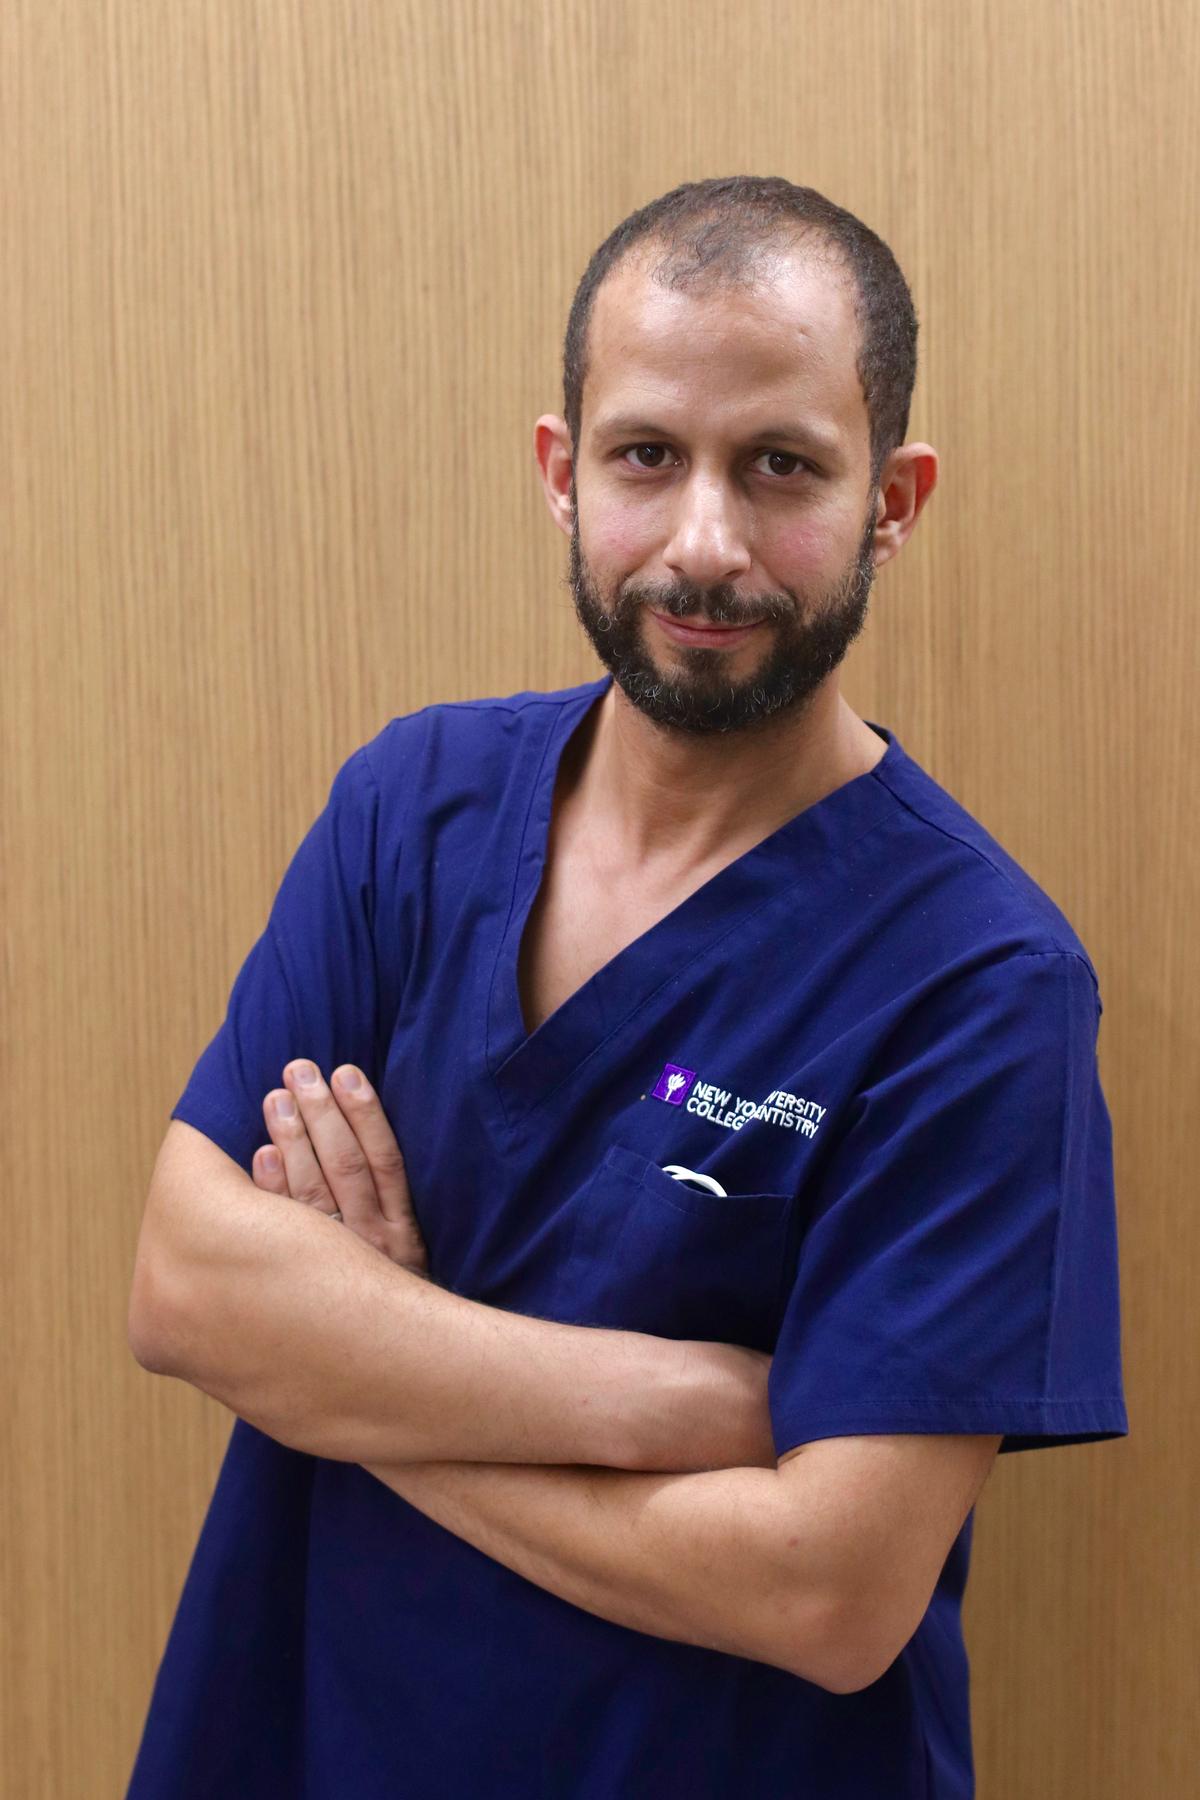 Dr Joseph Assad